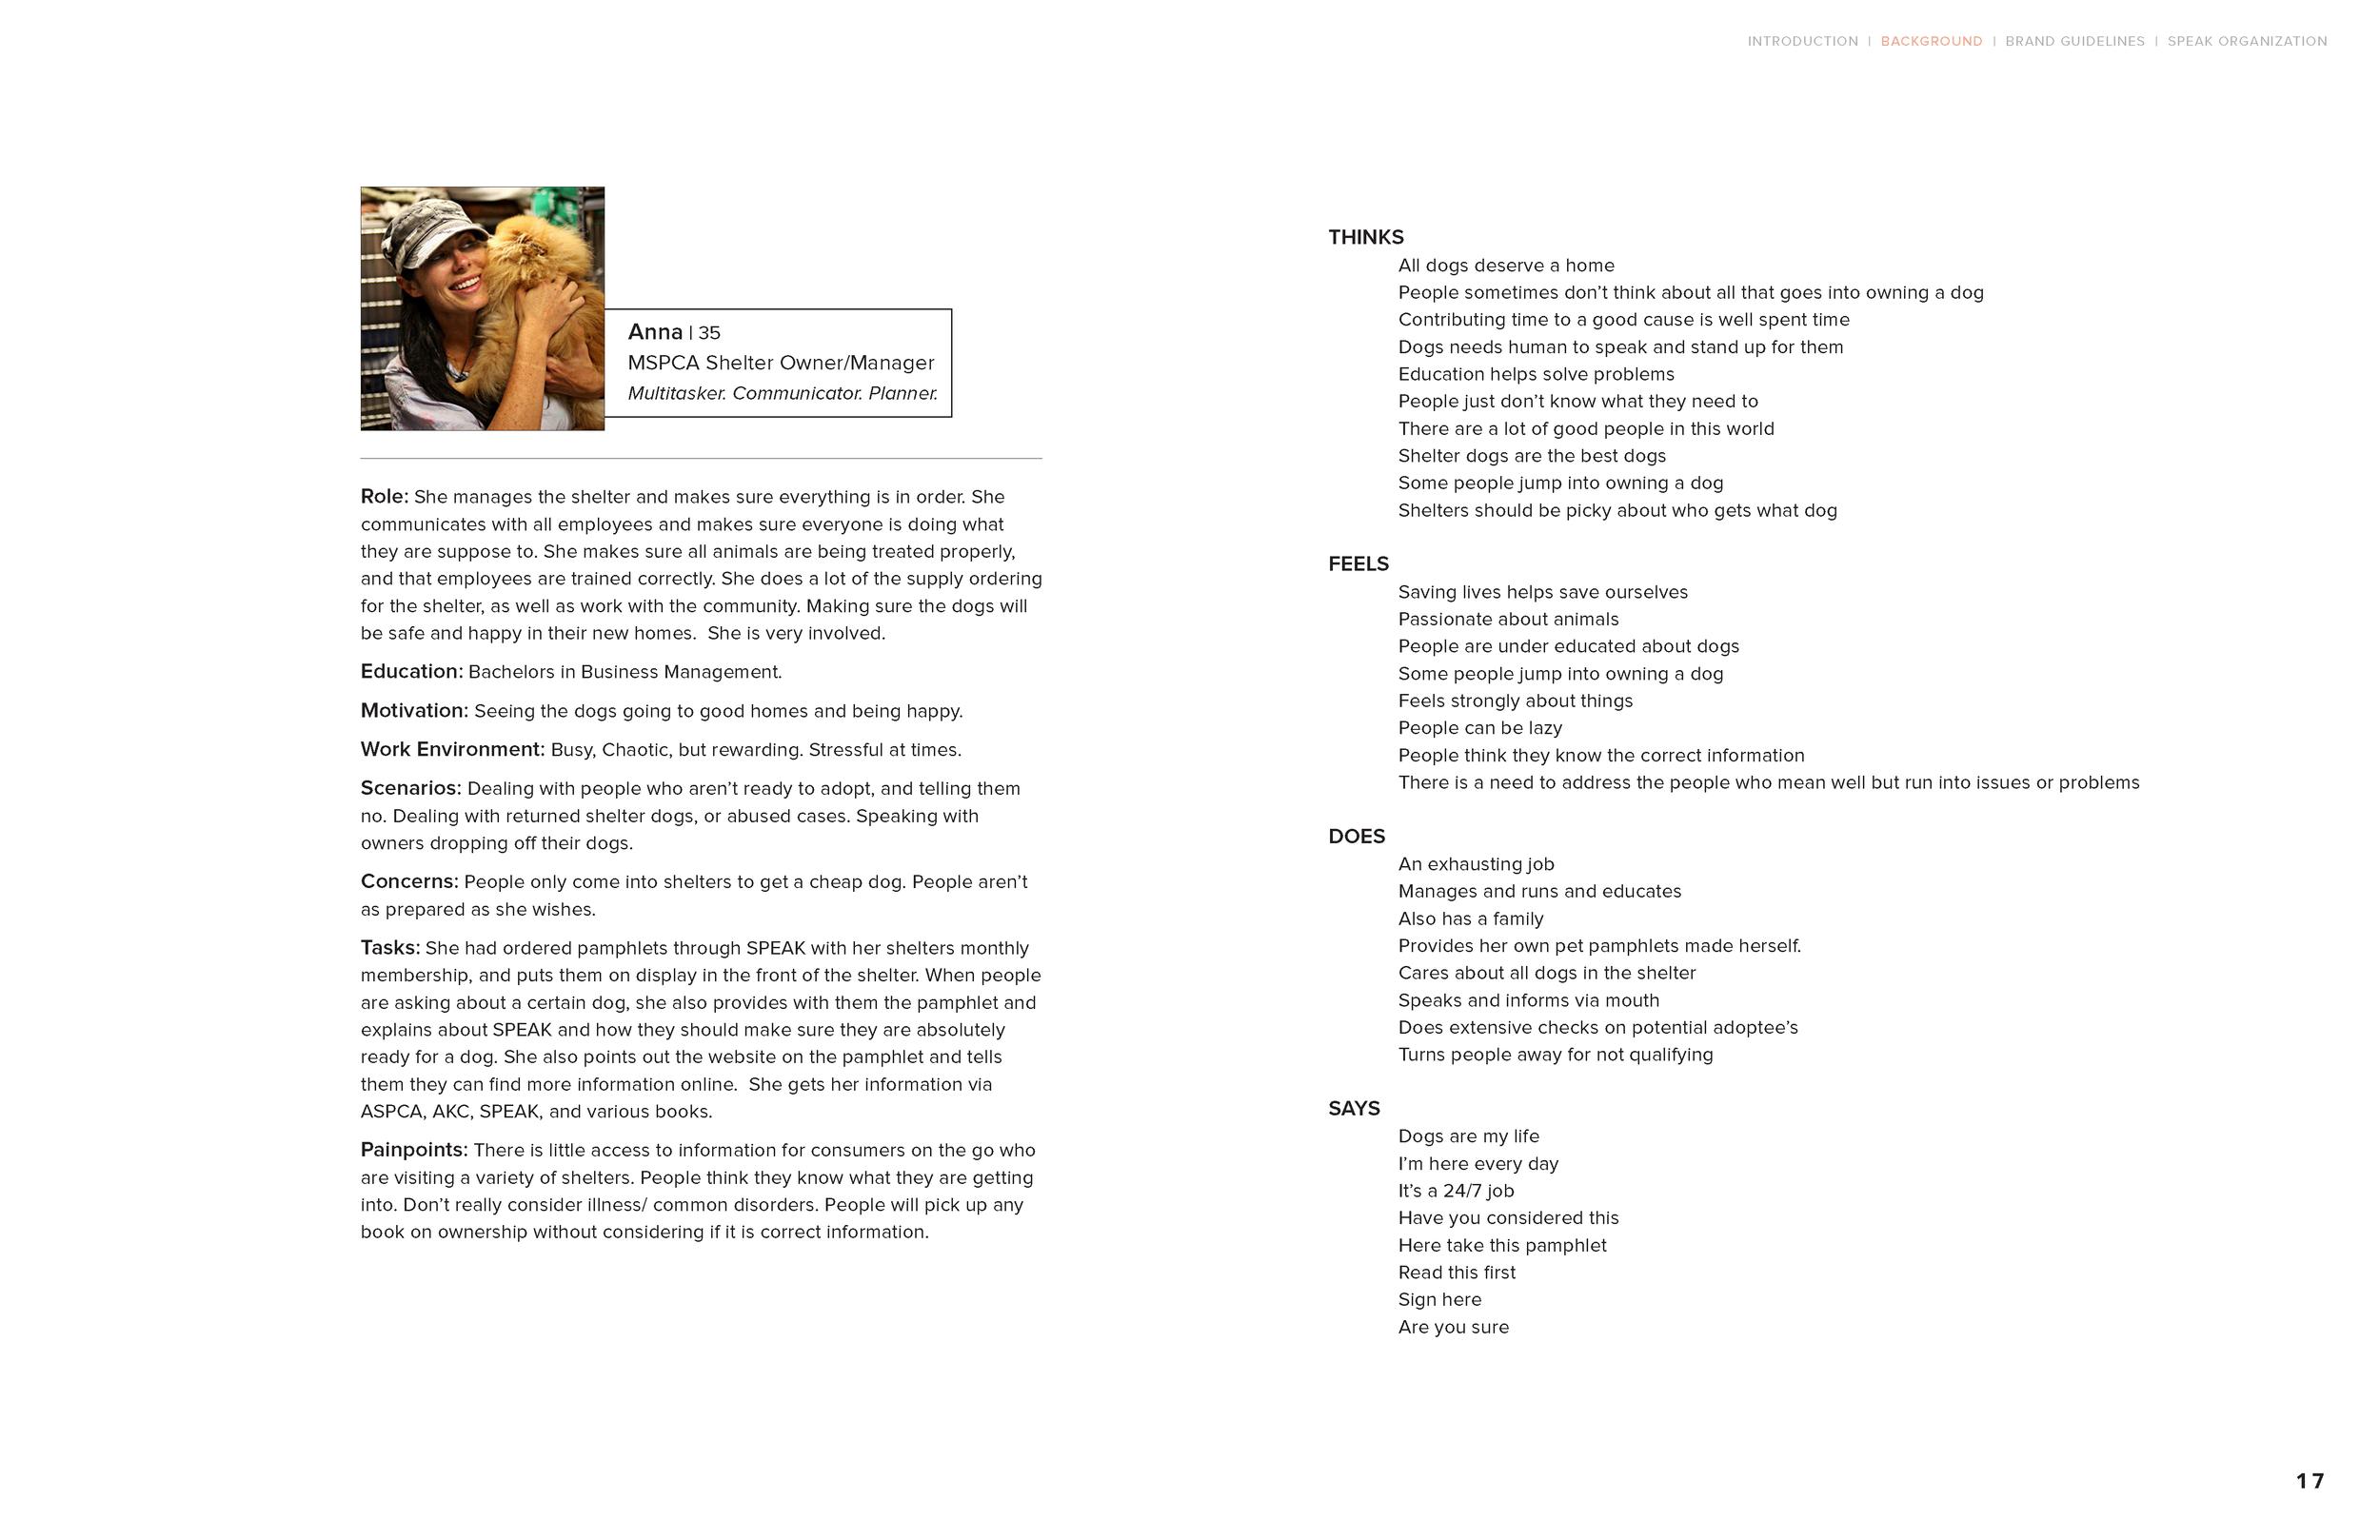 SPEAK_Booklet_Page_17.png